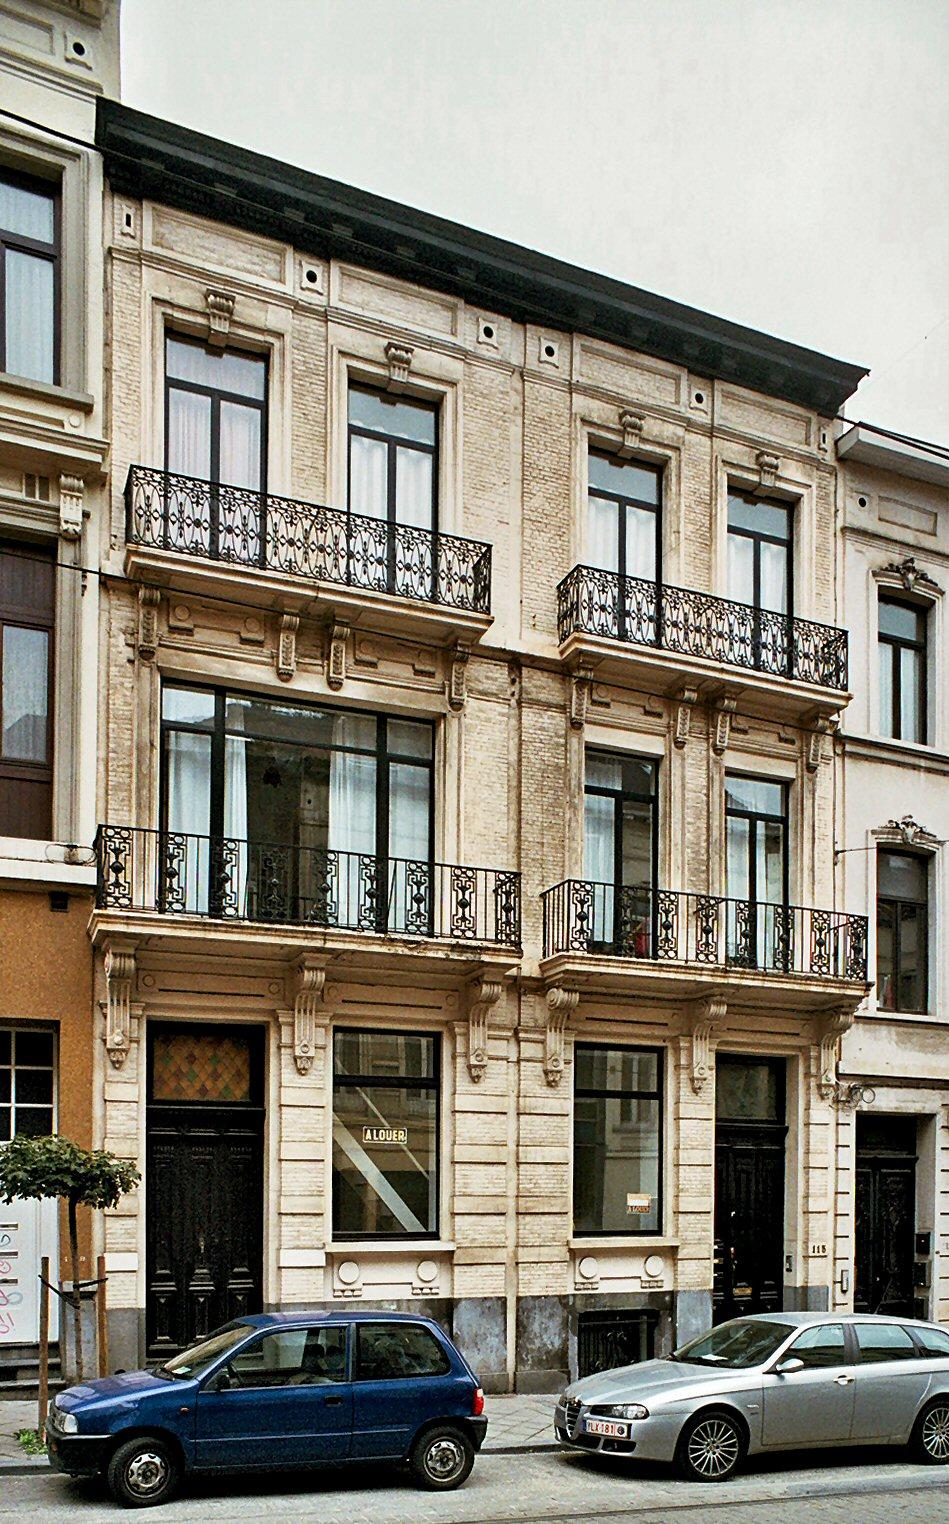 Rue Lesbroussart 117, 115., 2009